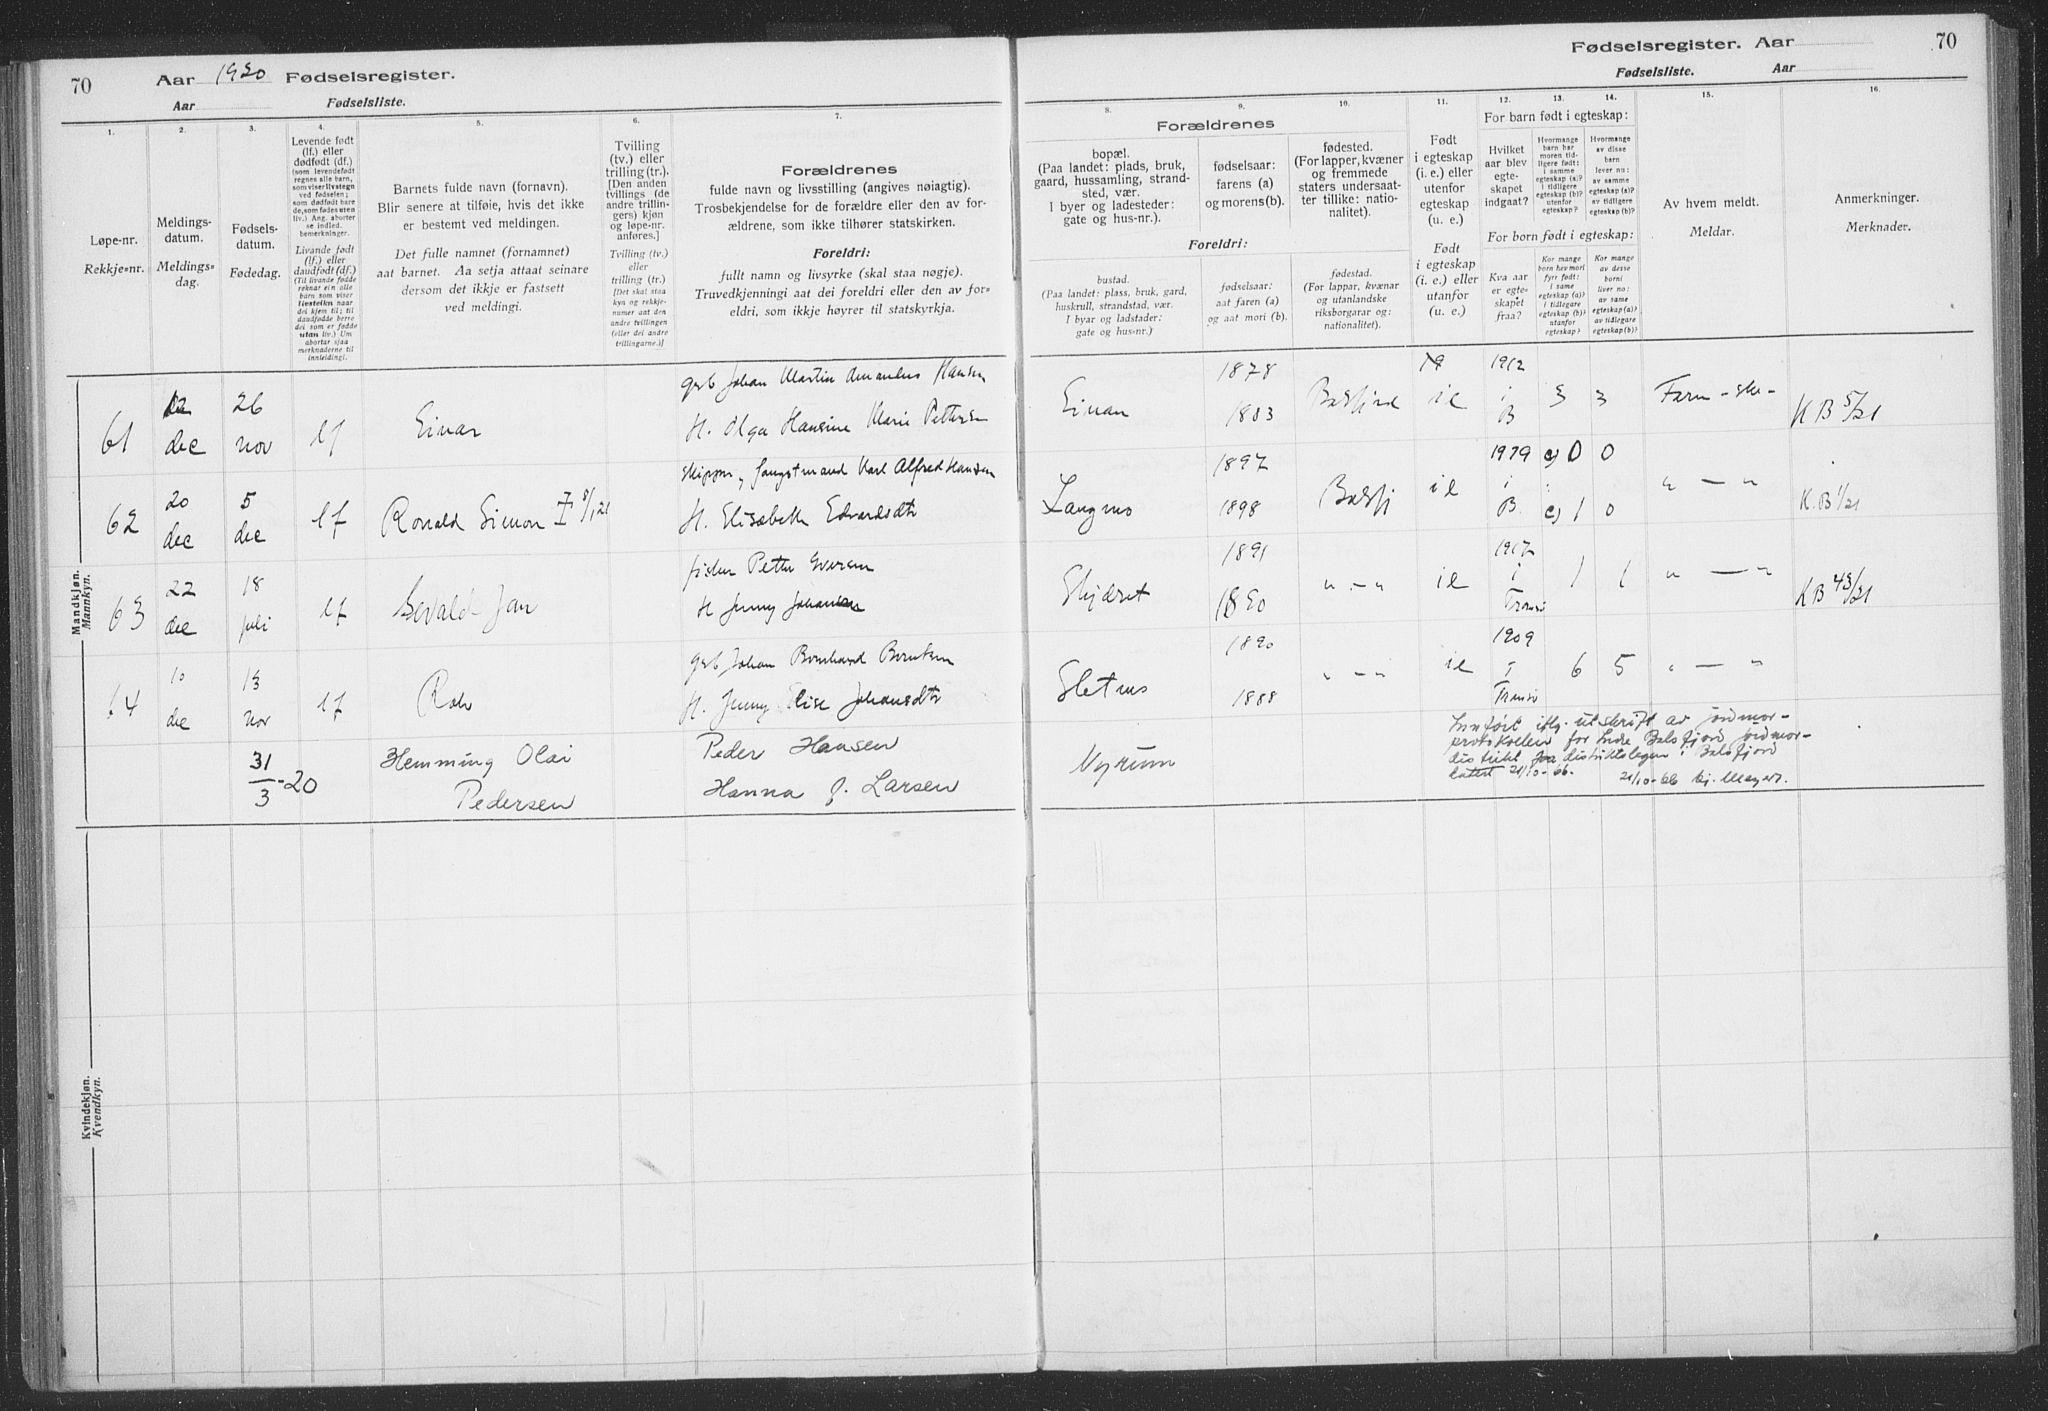 SATØ, Balsfjord sokneprestembete, Birth register no. 59, 1916-1930, p. 70